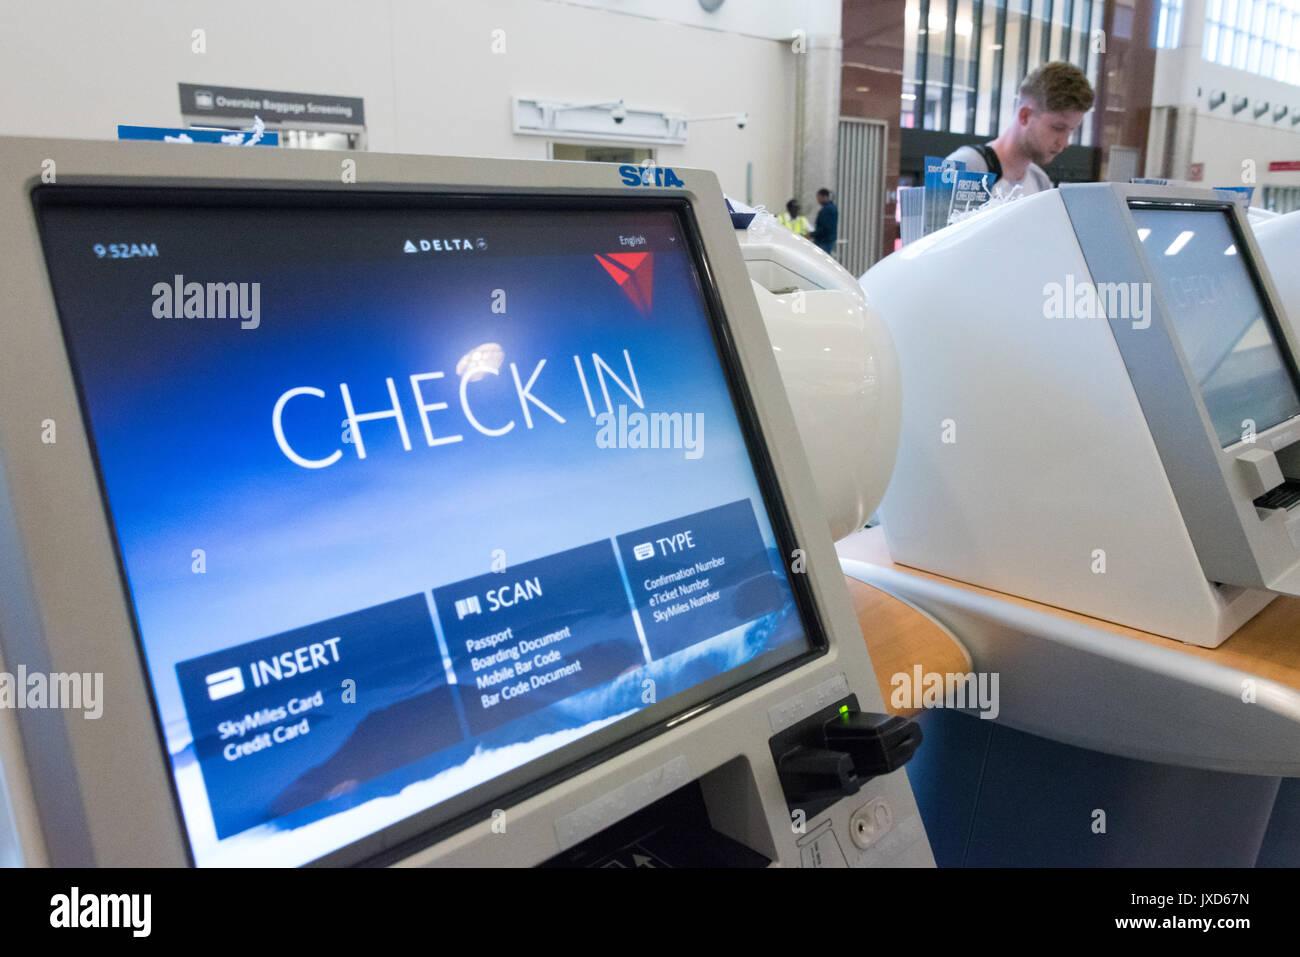 Delta Air Lines Check In kiosks at Hartsfield-Jackson Atlanta International Airport in Atlanta, Georgia, USA. - Stock Image